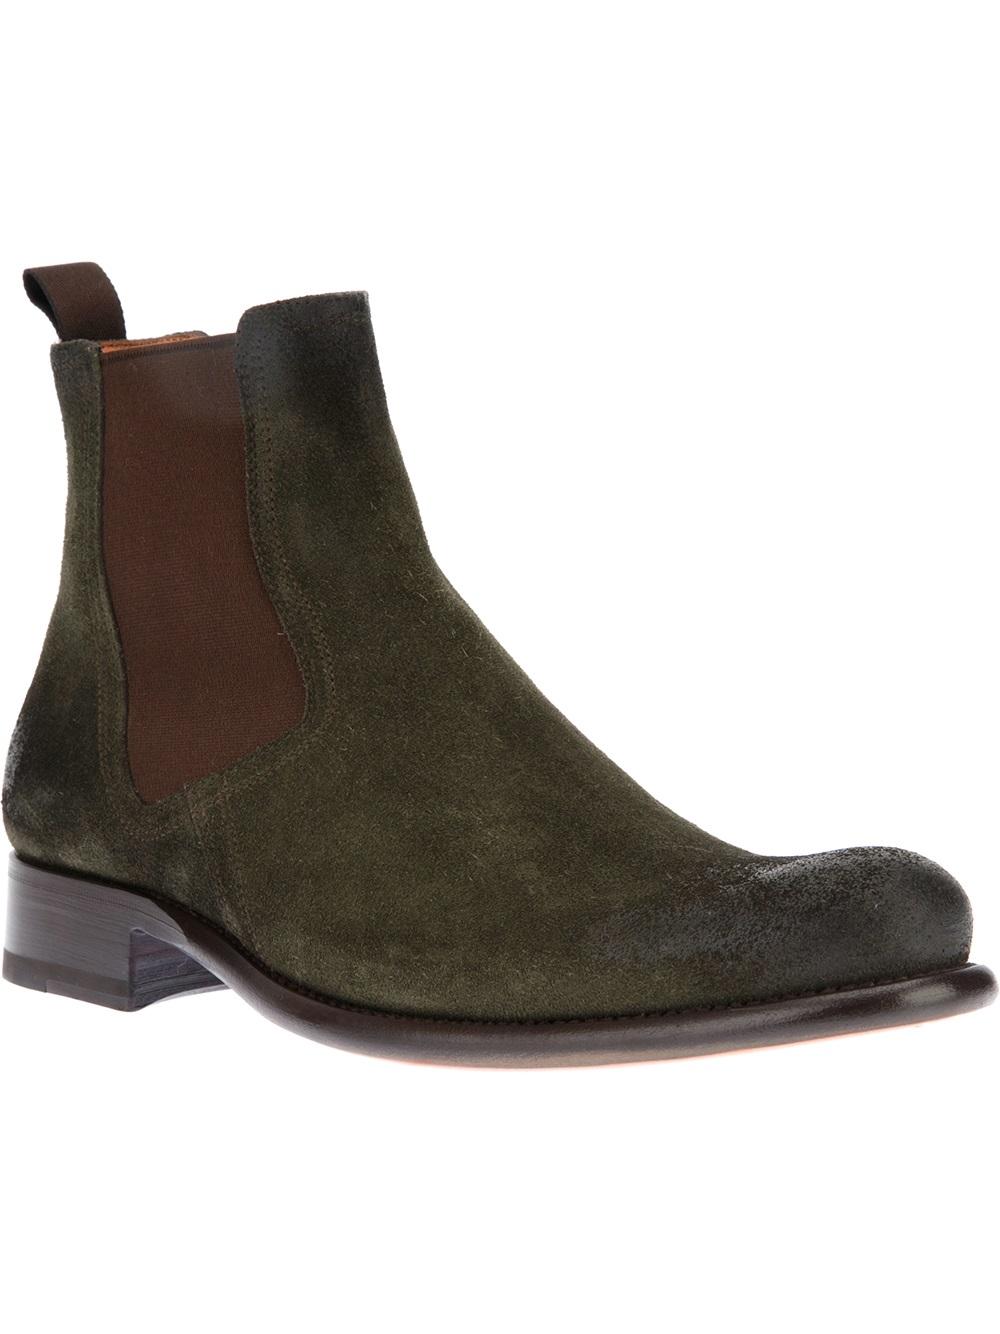 santoni chelsea boot in green for men lyst. Black Bedroom Furniture Sets. Home Design Ideas